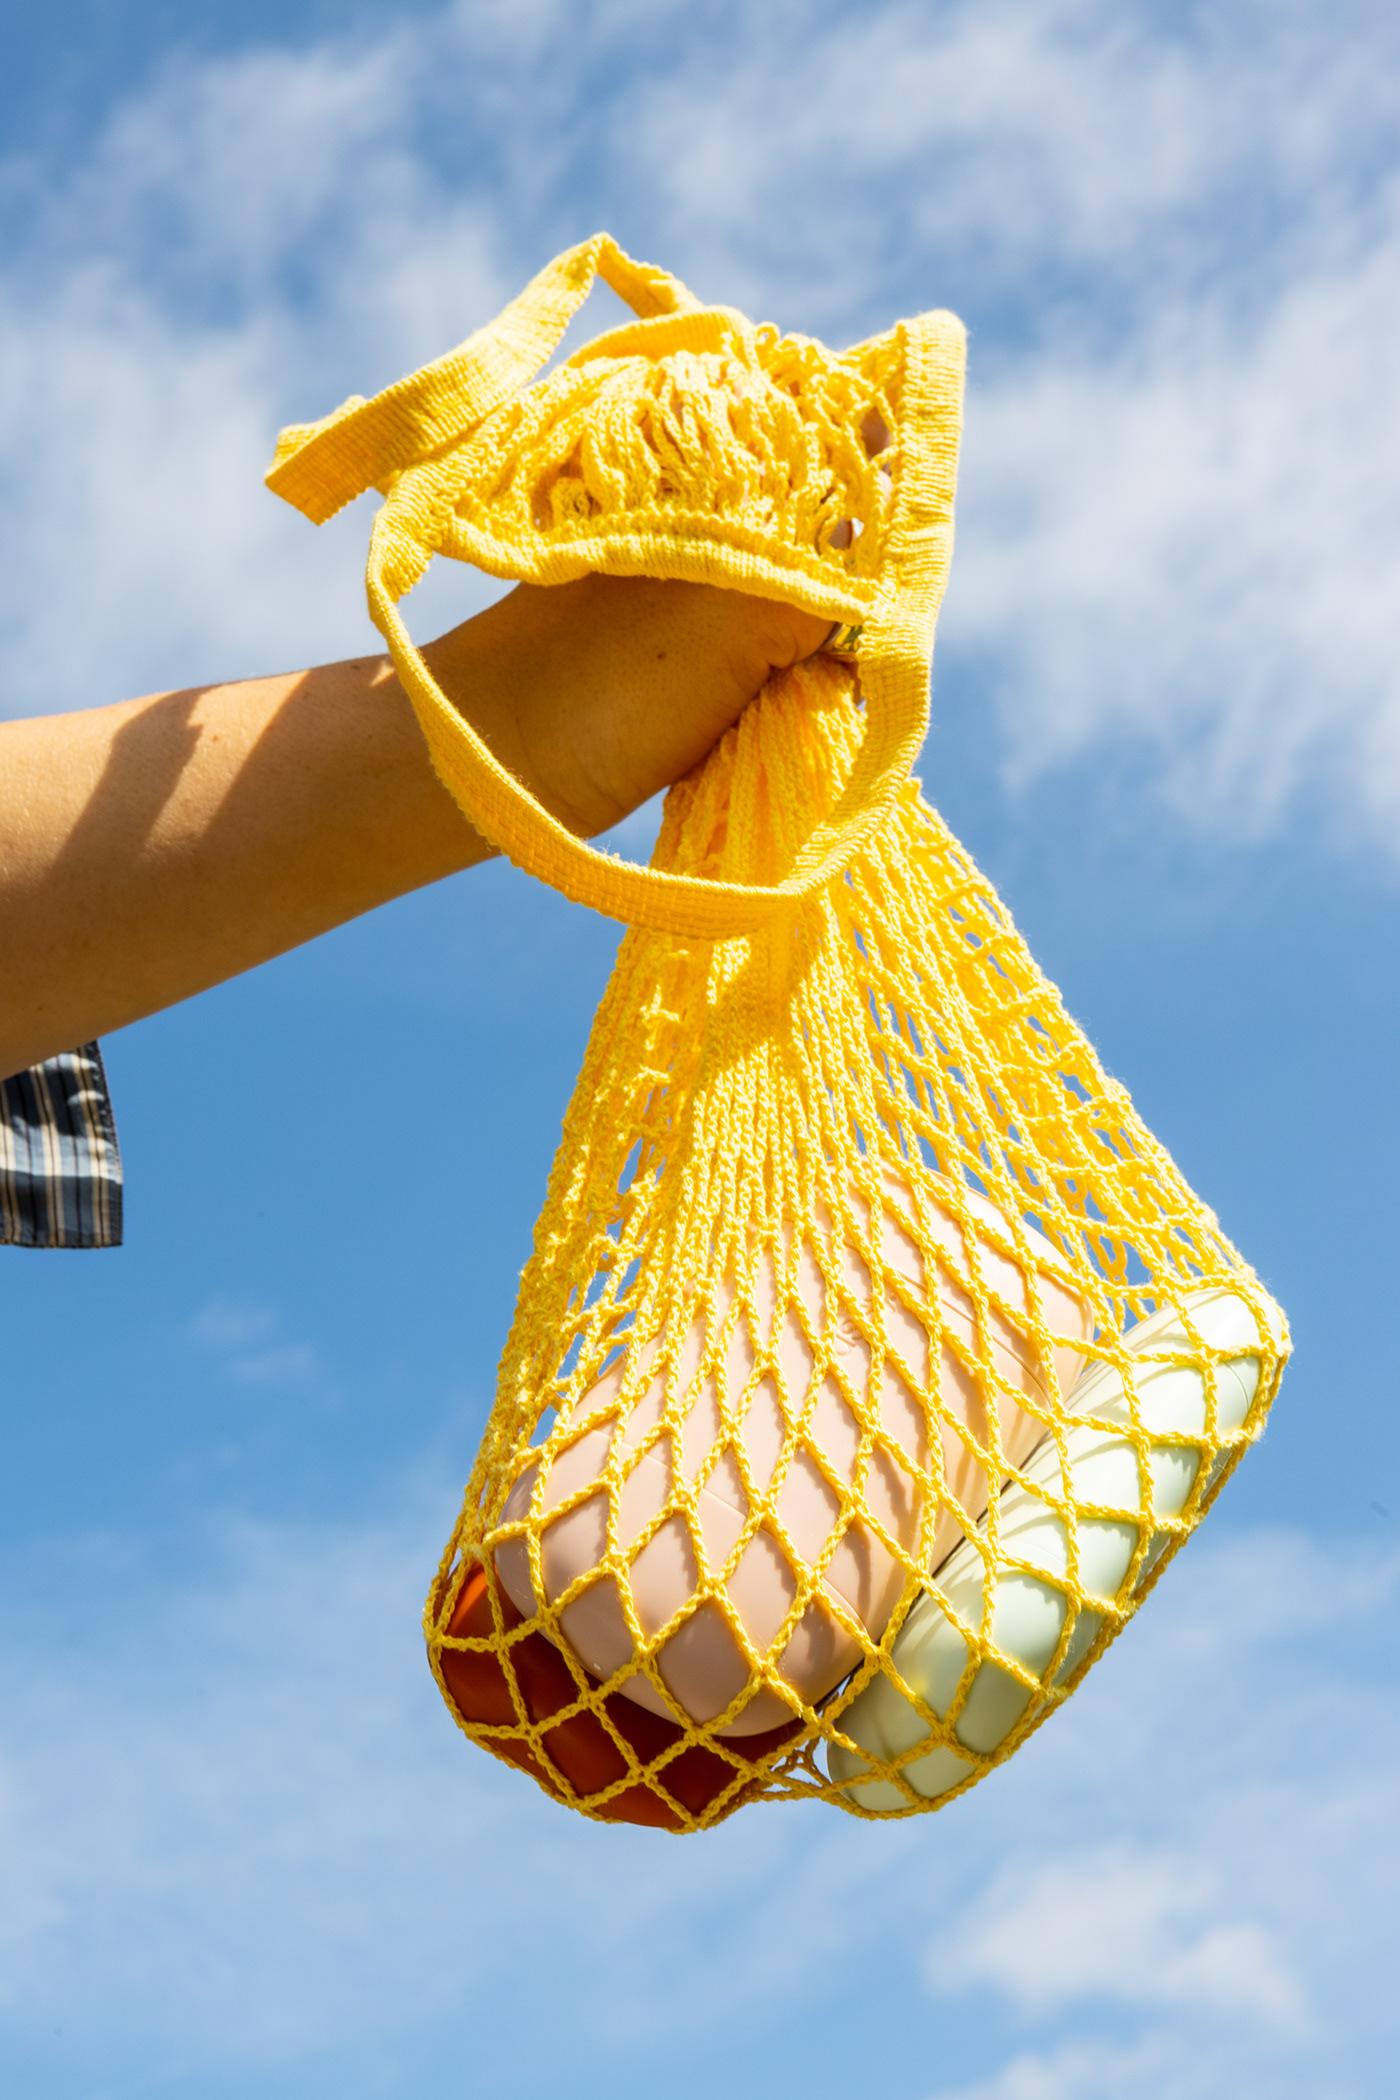 animation  branding  deodorant environment Packaging recycling social media